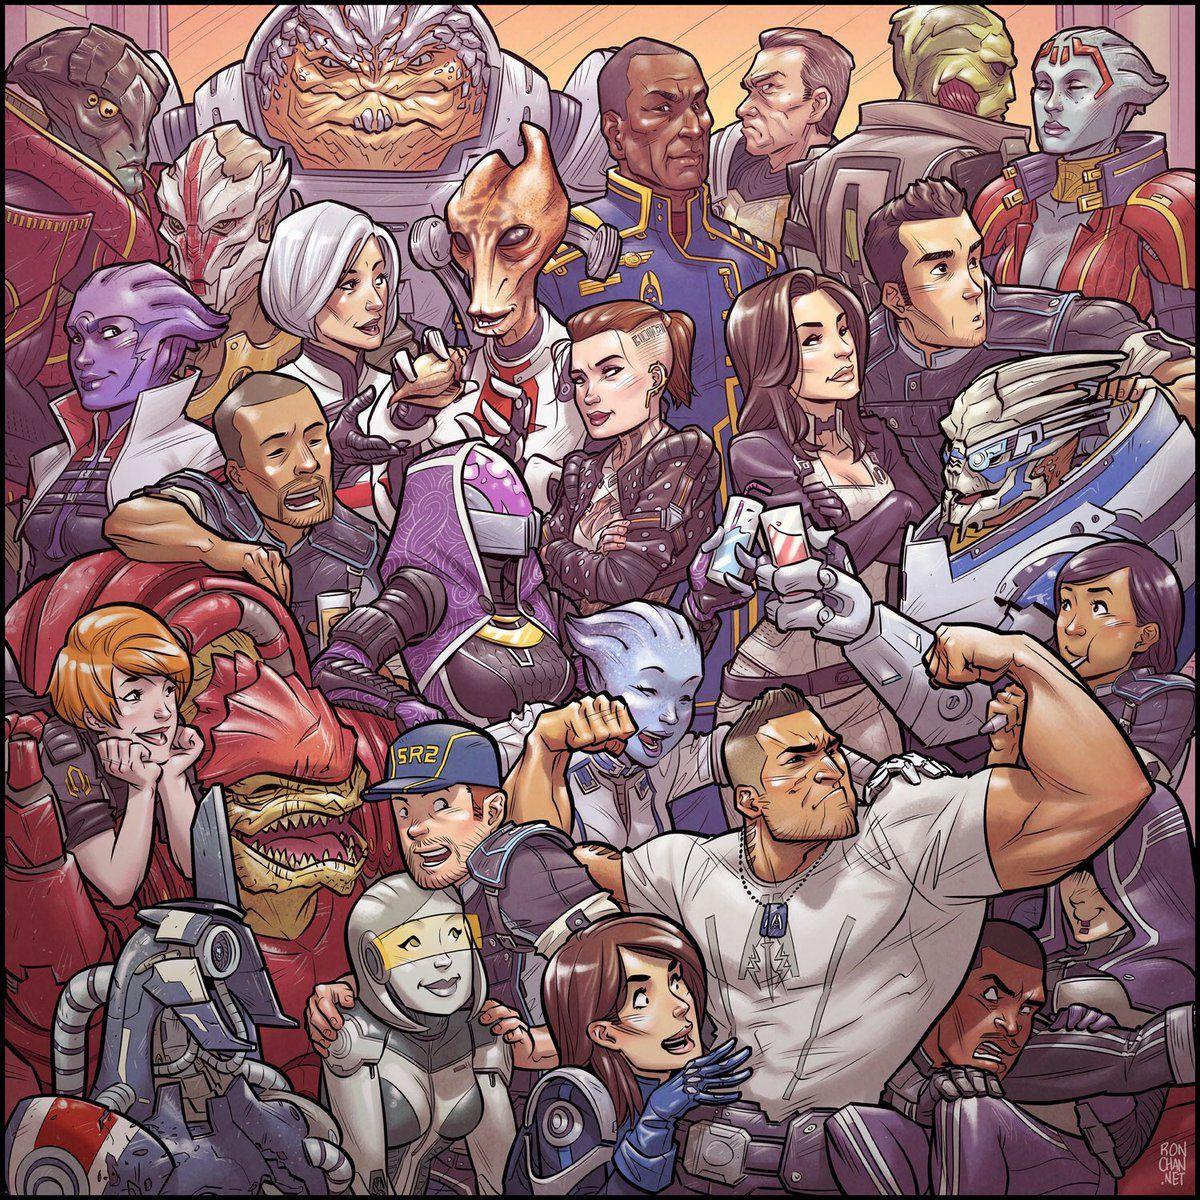 Mass Effect Trilogy Art by: Ron Chan (@RonDanChan) | Twitter | Mass effect  funny, Mass effect art, Mass effect